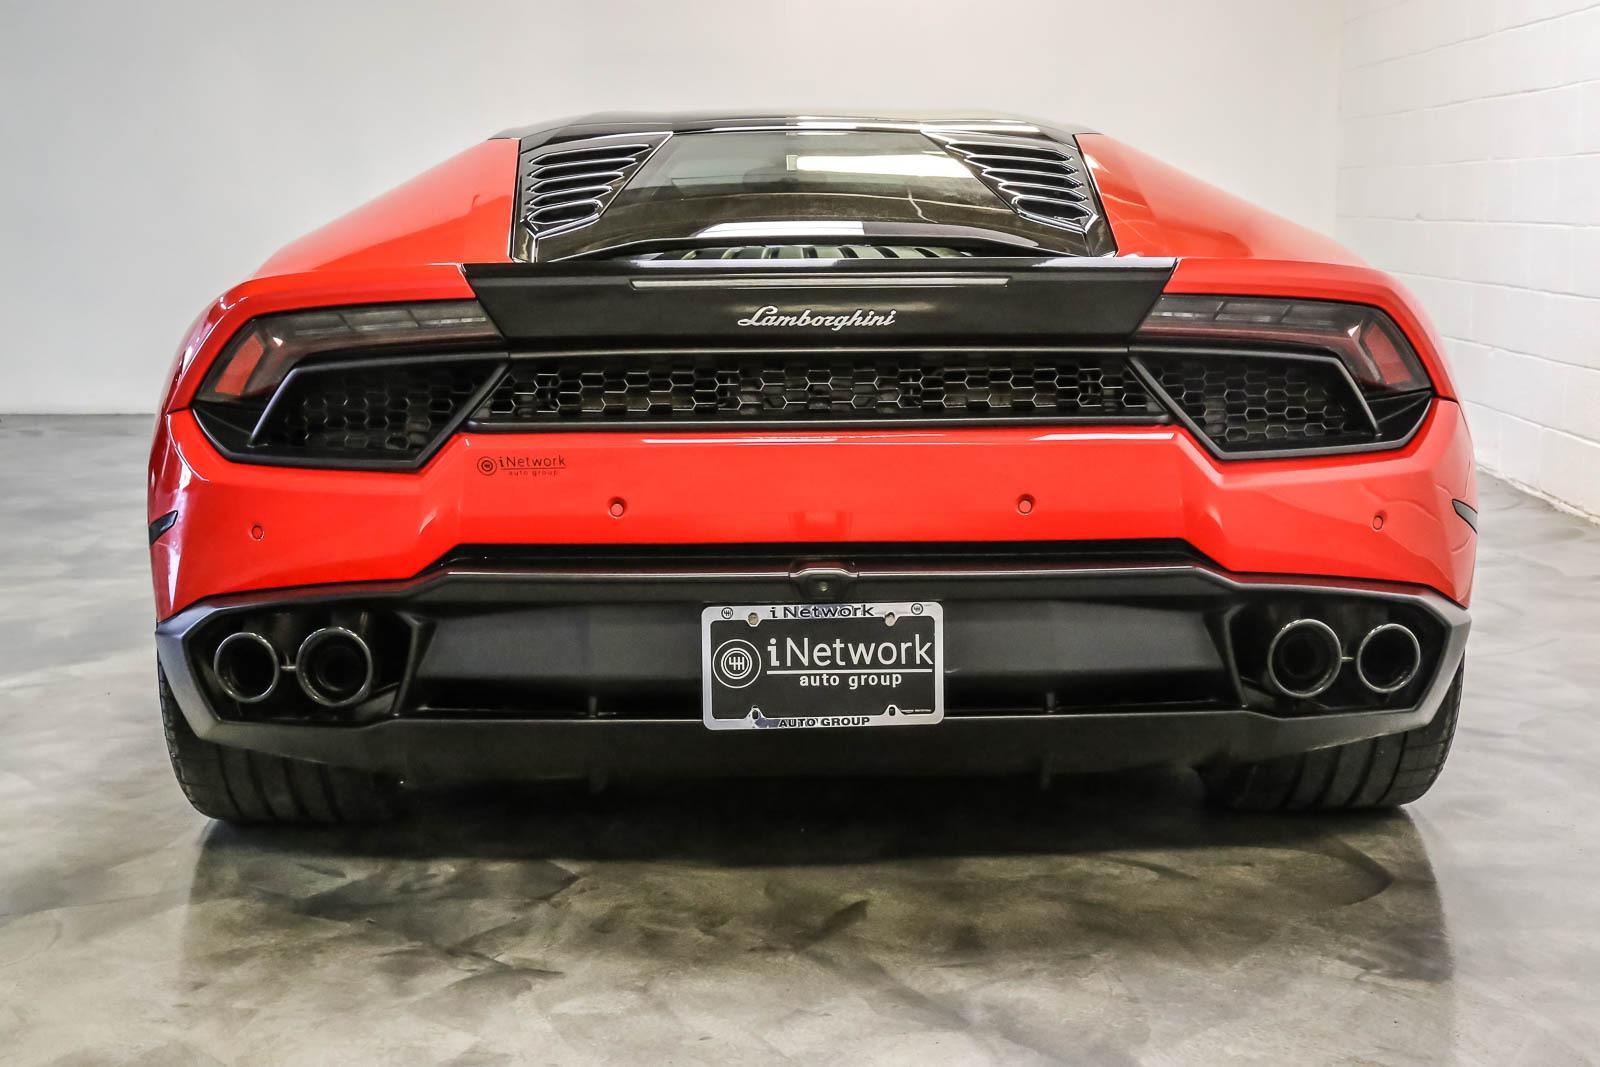 Used 2016 Lamborghini Huracan Lp580 2 For Sale 179 891 Inetwork